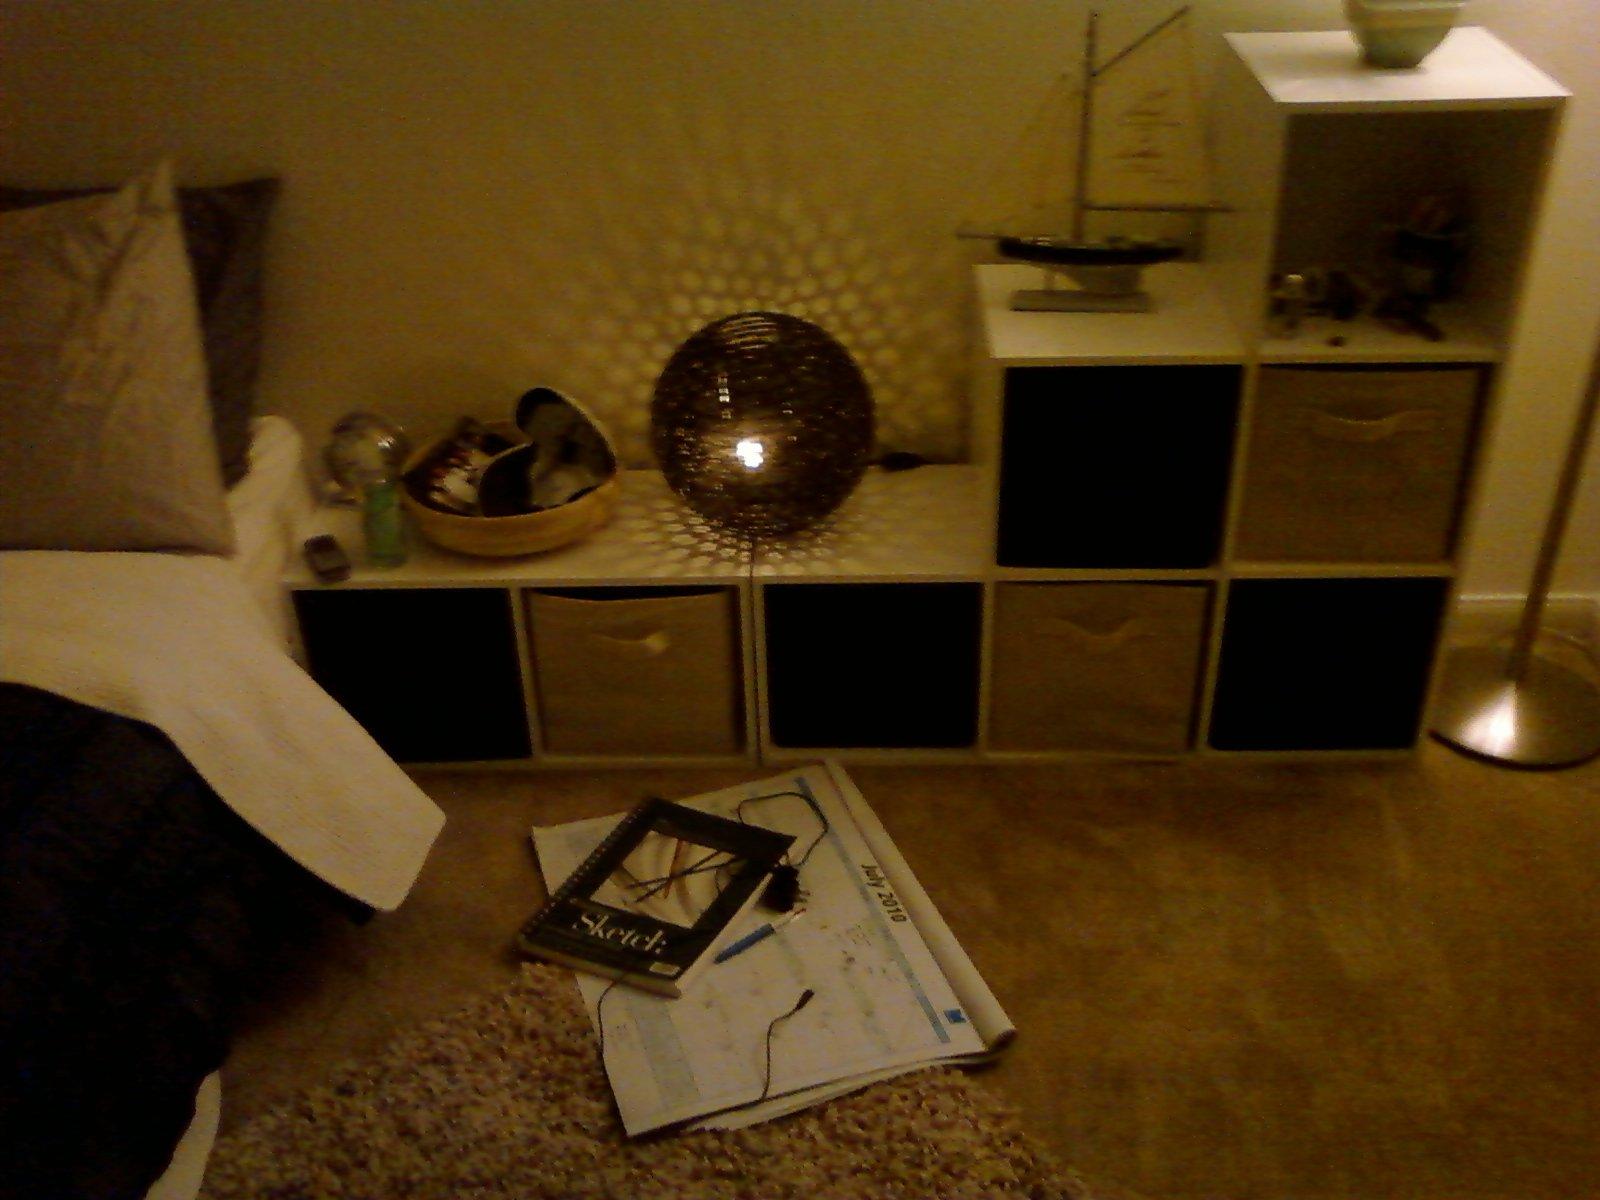 Wohnzimmer Mit Ikea Einrichten ~ Ikea Regolit night light  IKEA Hackers  IKEA Hackers